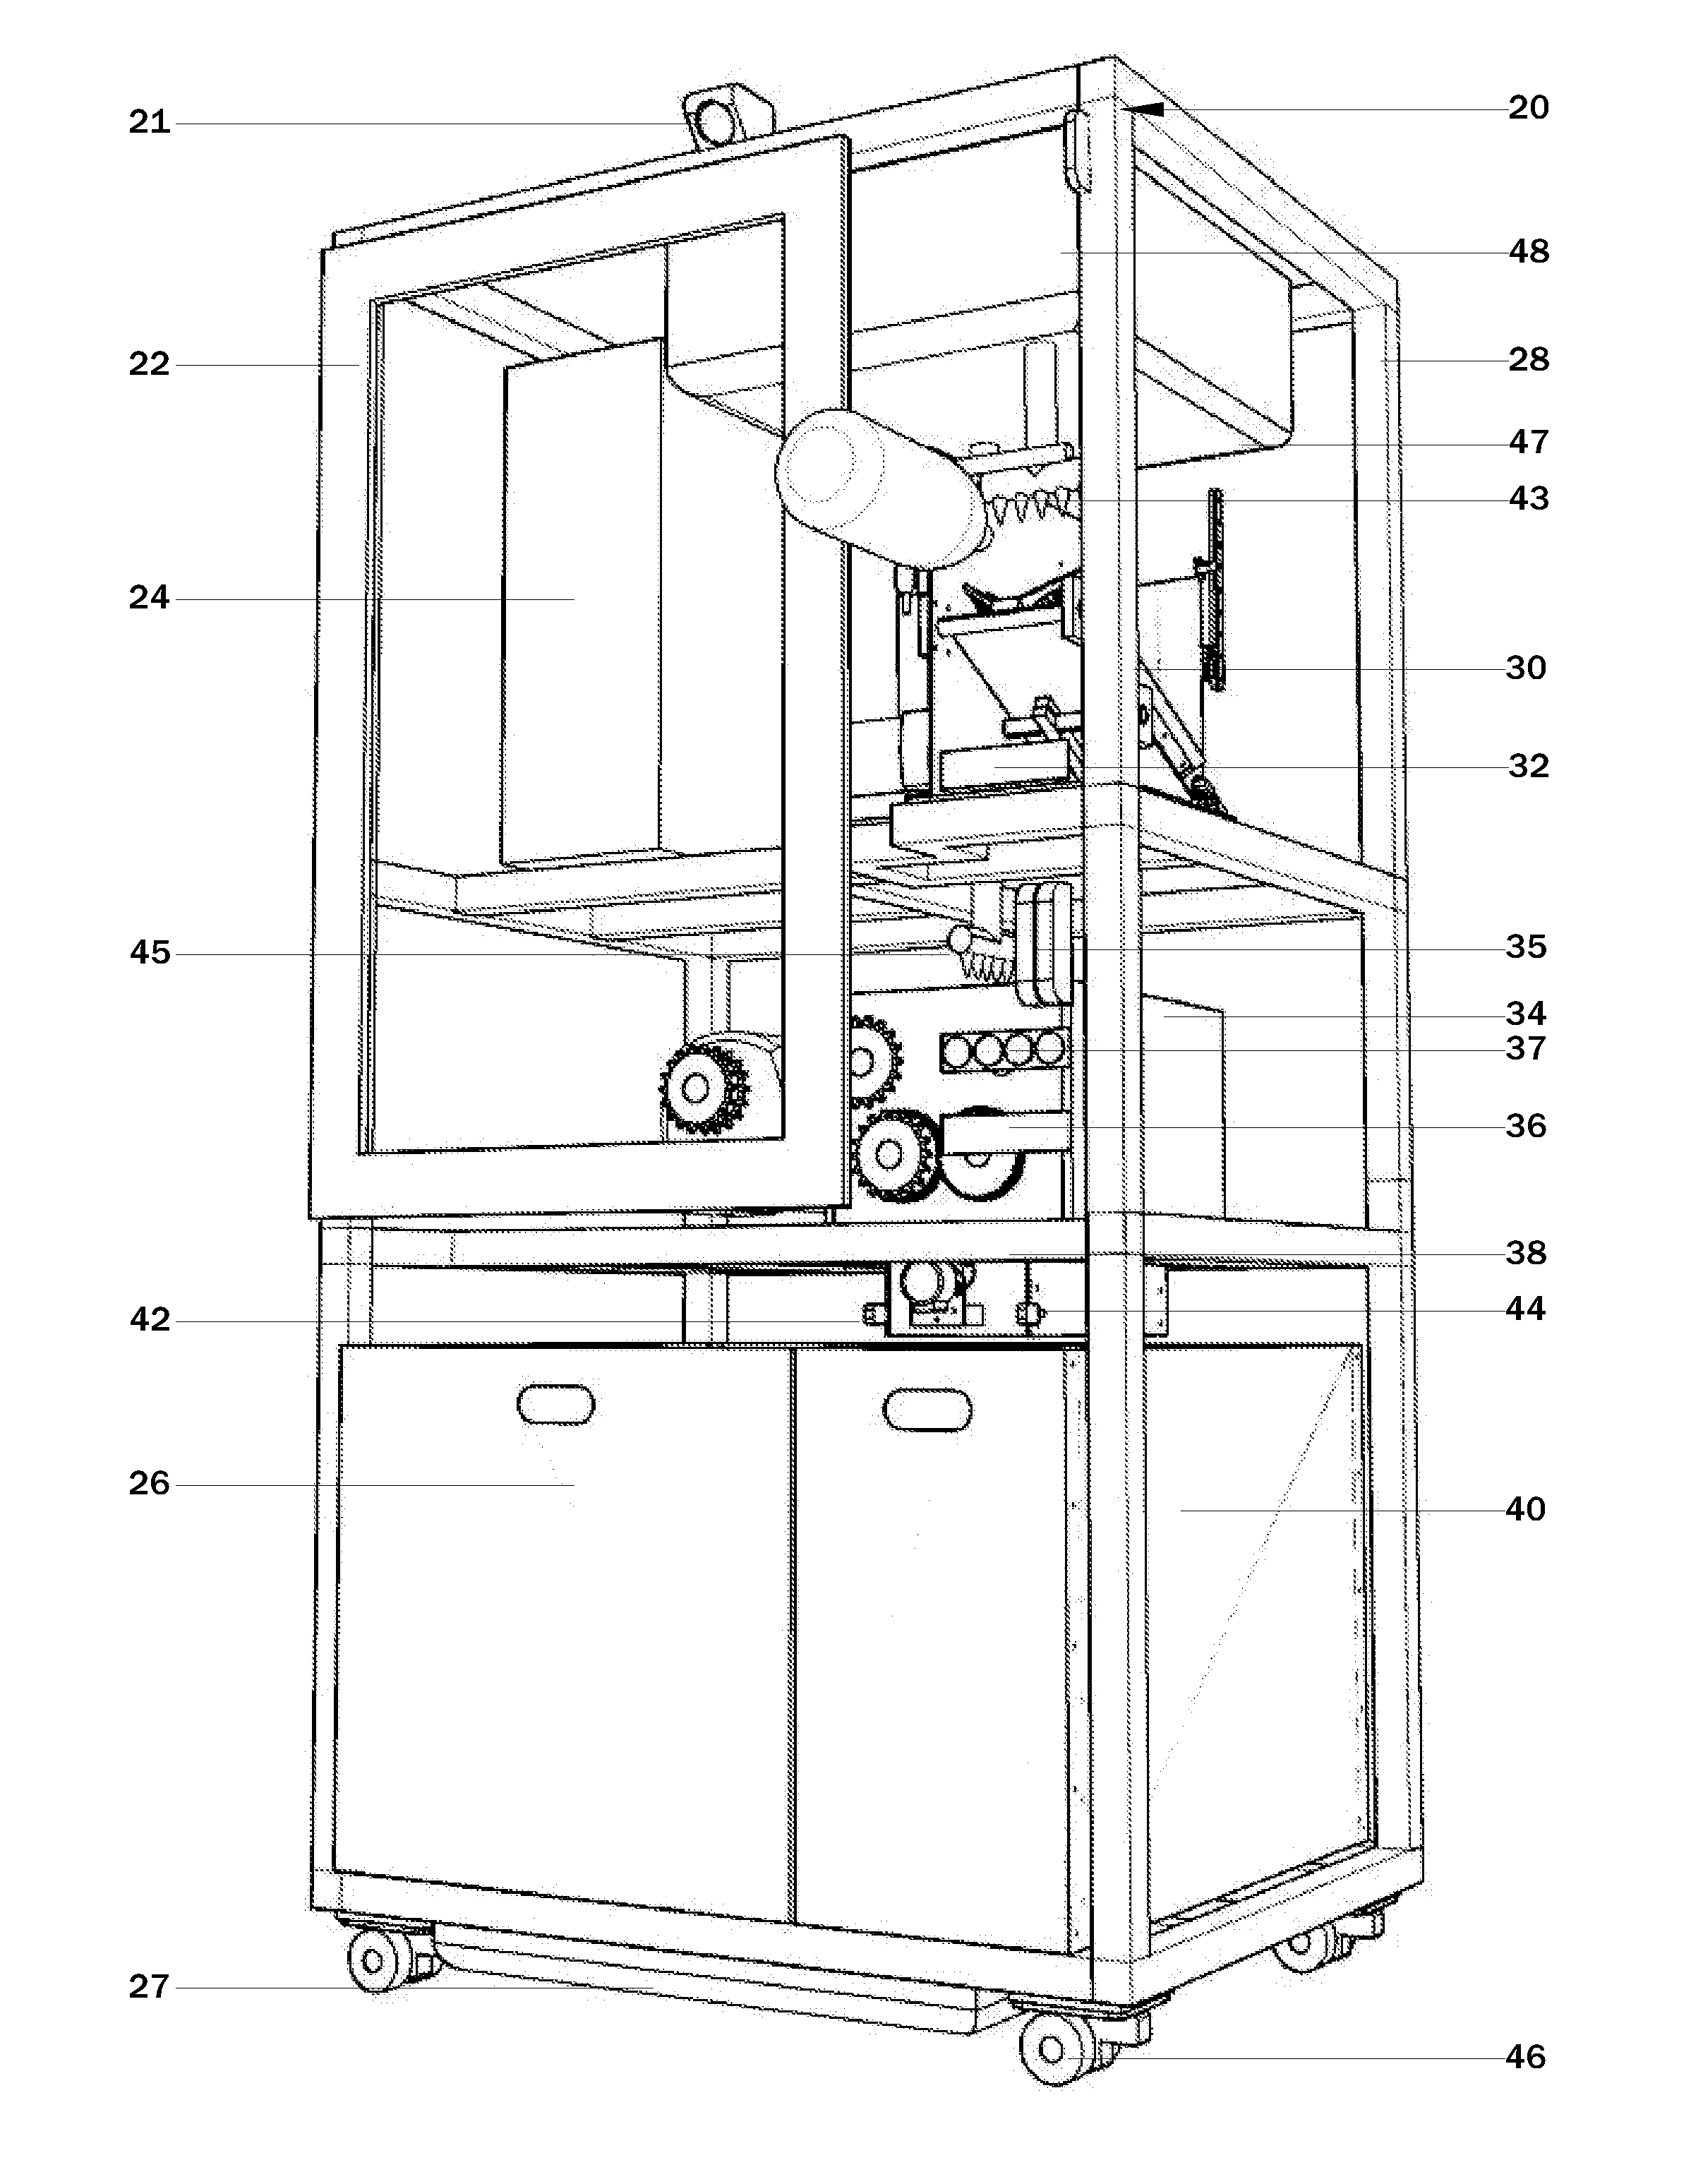 Vending Machine Schematic